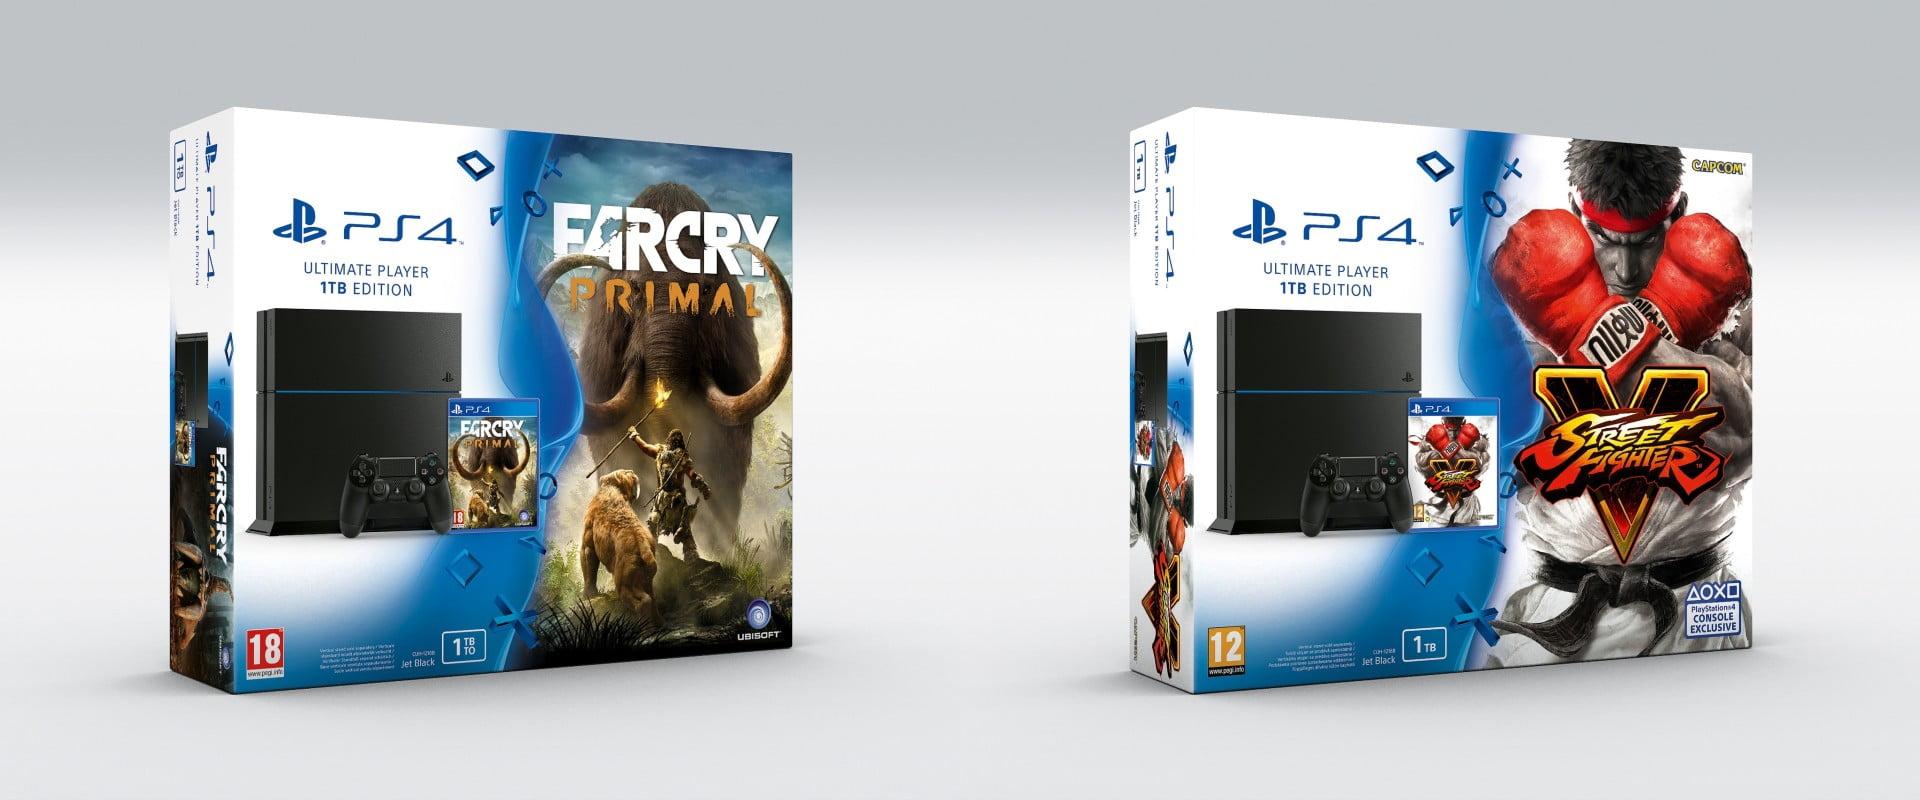 promo les packs ps4 1to 2 jeux sfv far cry primal etc 419. Black Bedroom Furniture Sets. Home Design Ideas